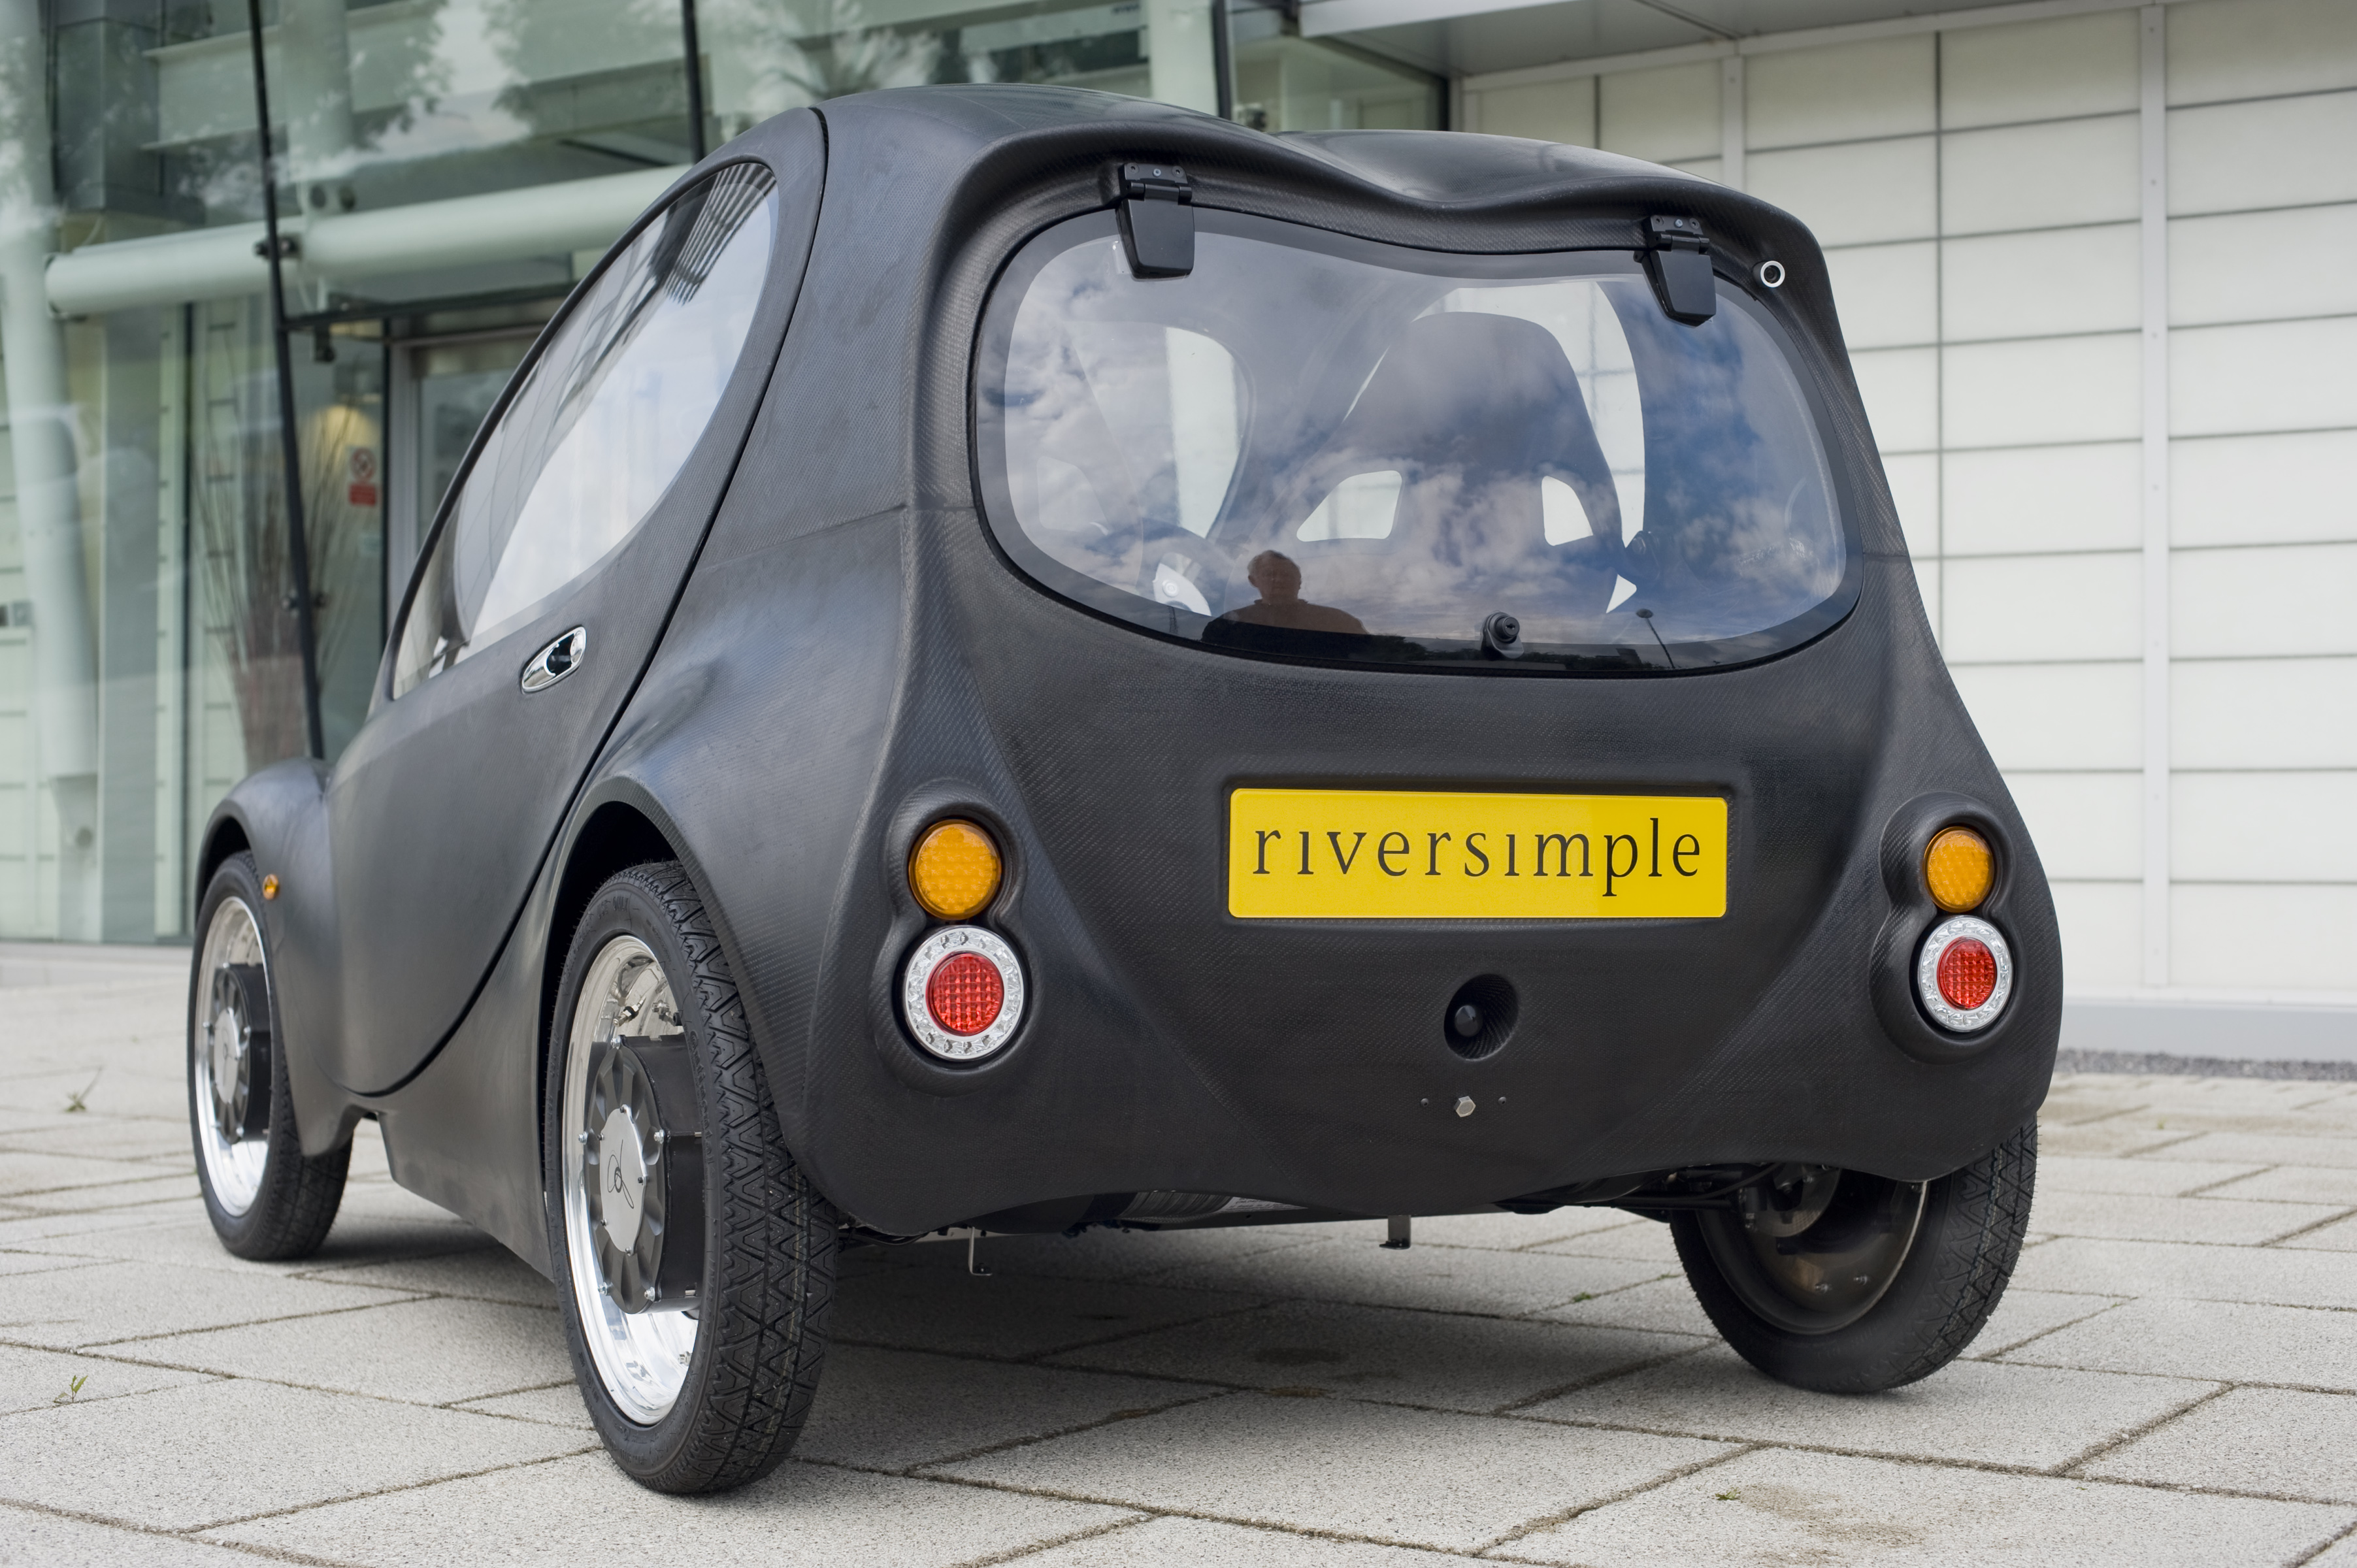 Foto: riversimple.com